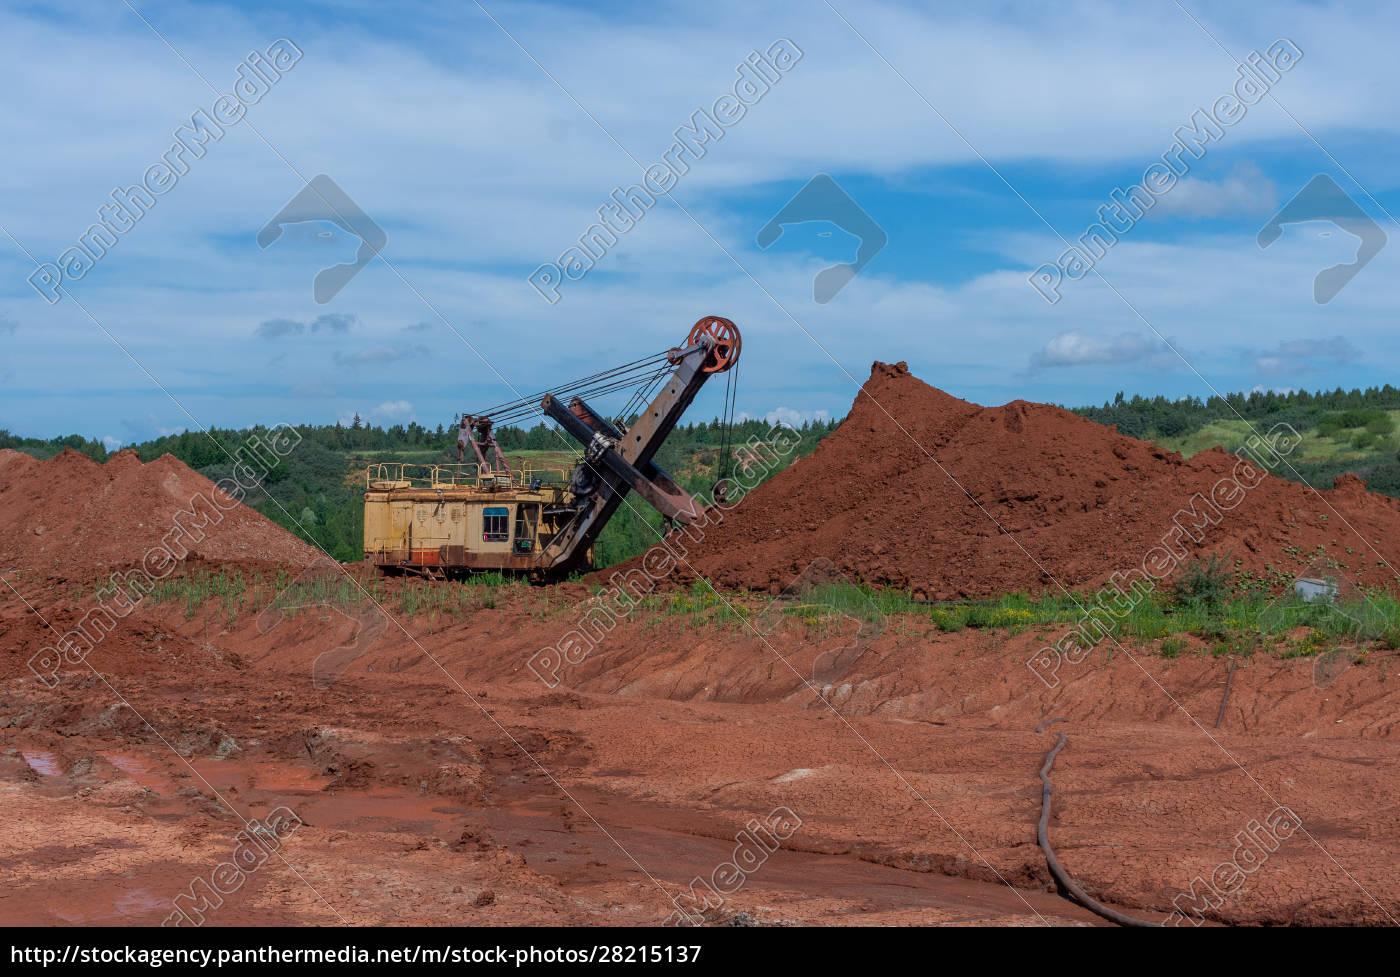 giant, excavator, machinery, industry - 28215137